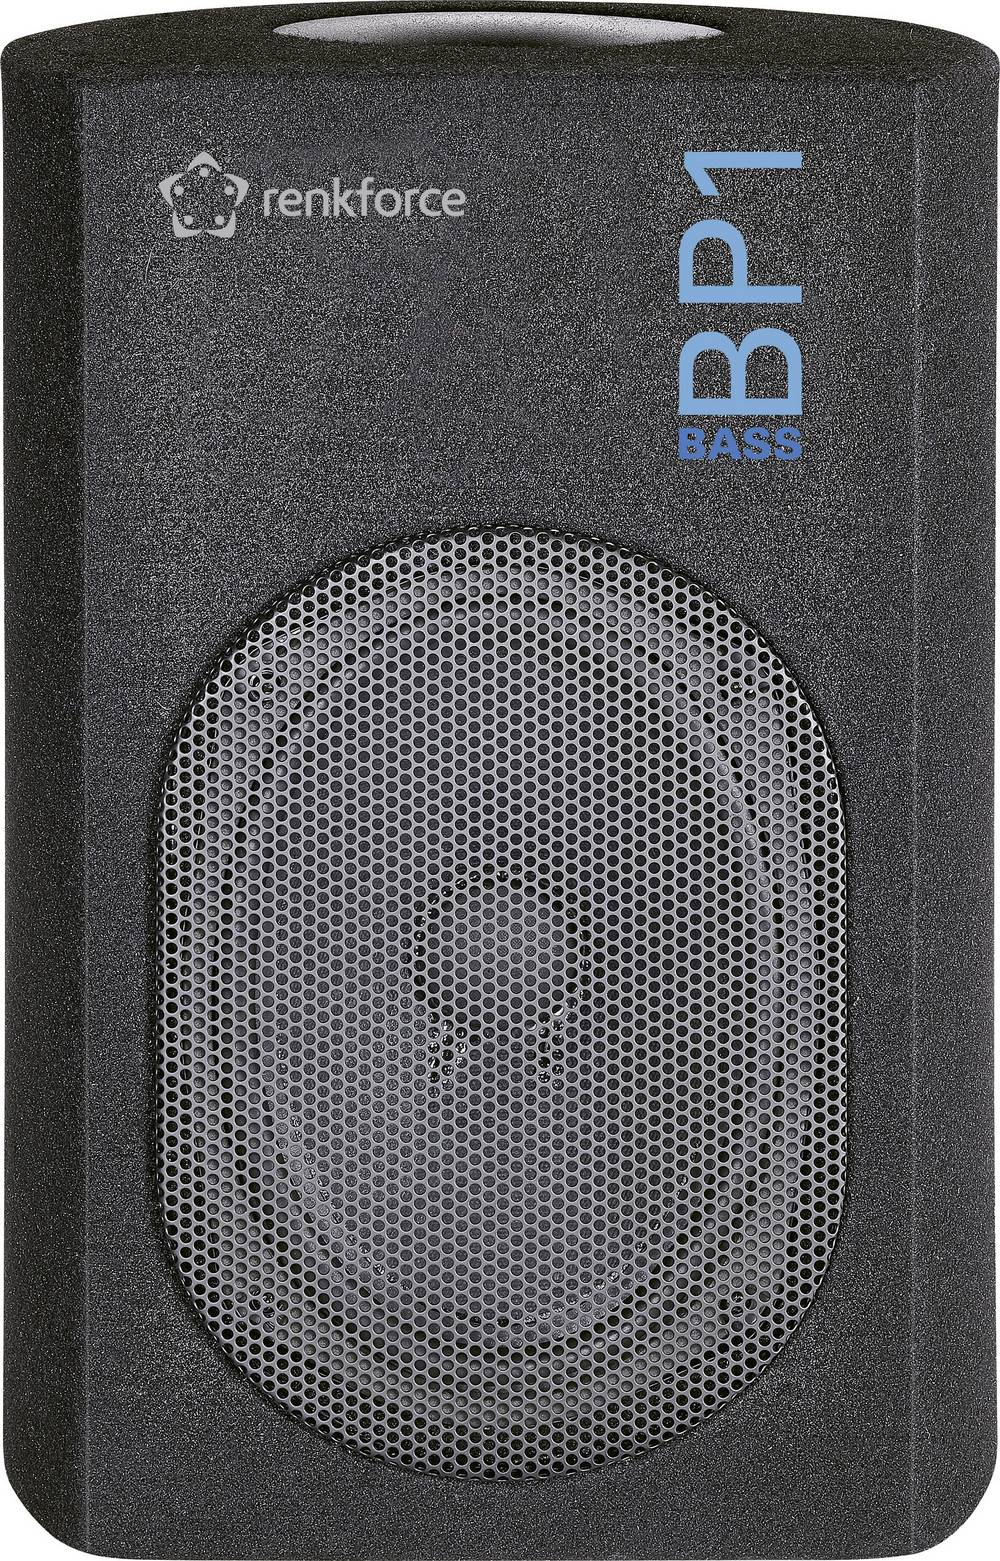 Auto-passiv subwoofer Renkforce Bass BP1 80 W